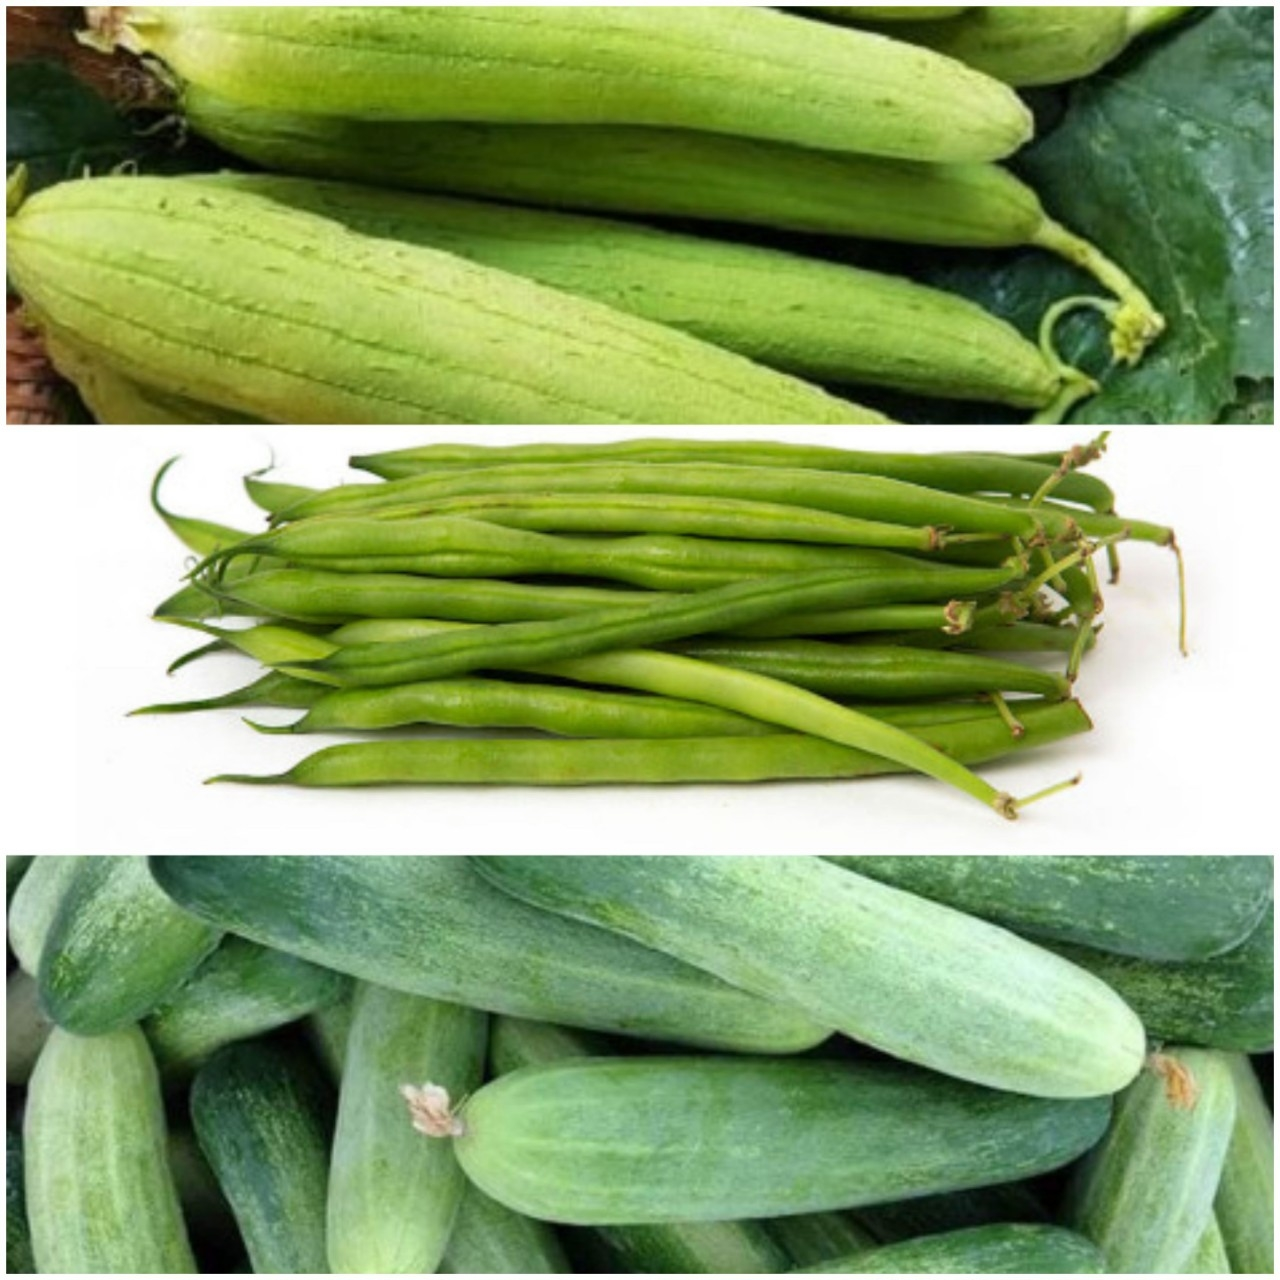 Combo rau củ quả ( 2 kg dưa leo + 1 kg mướp + 1 kg đậu que)